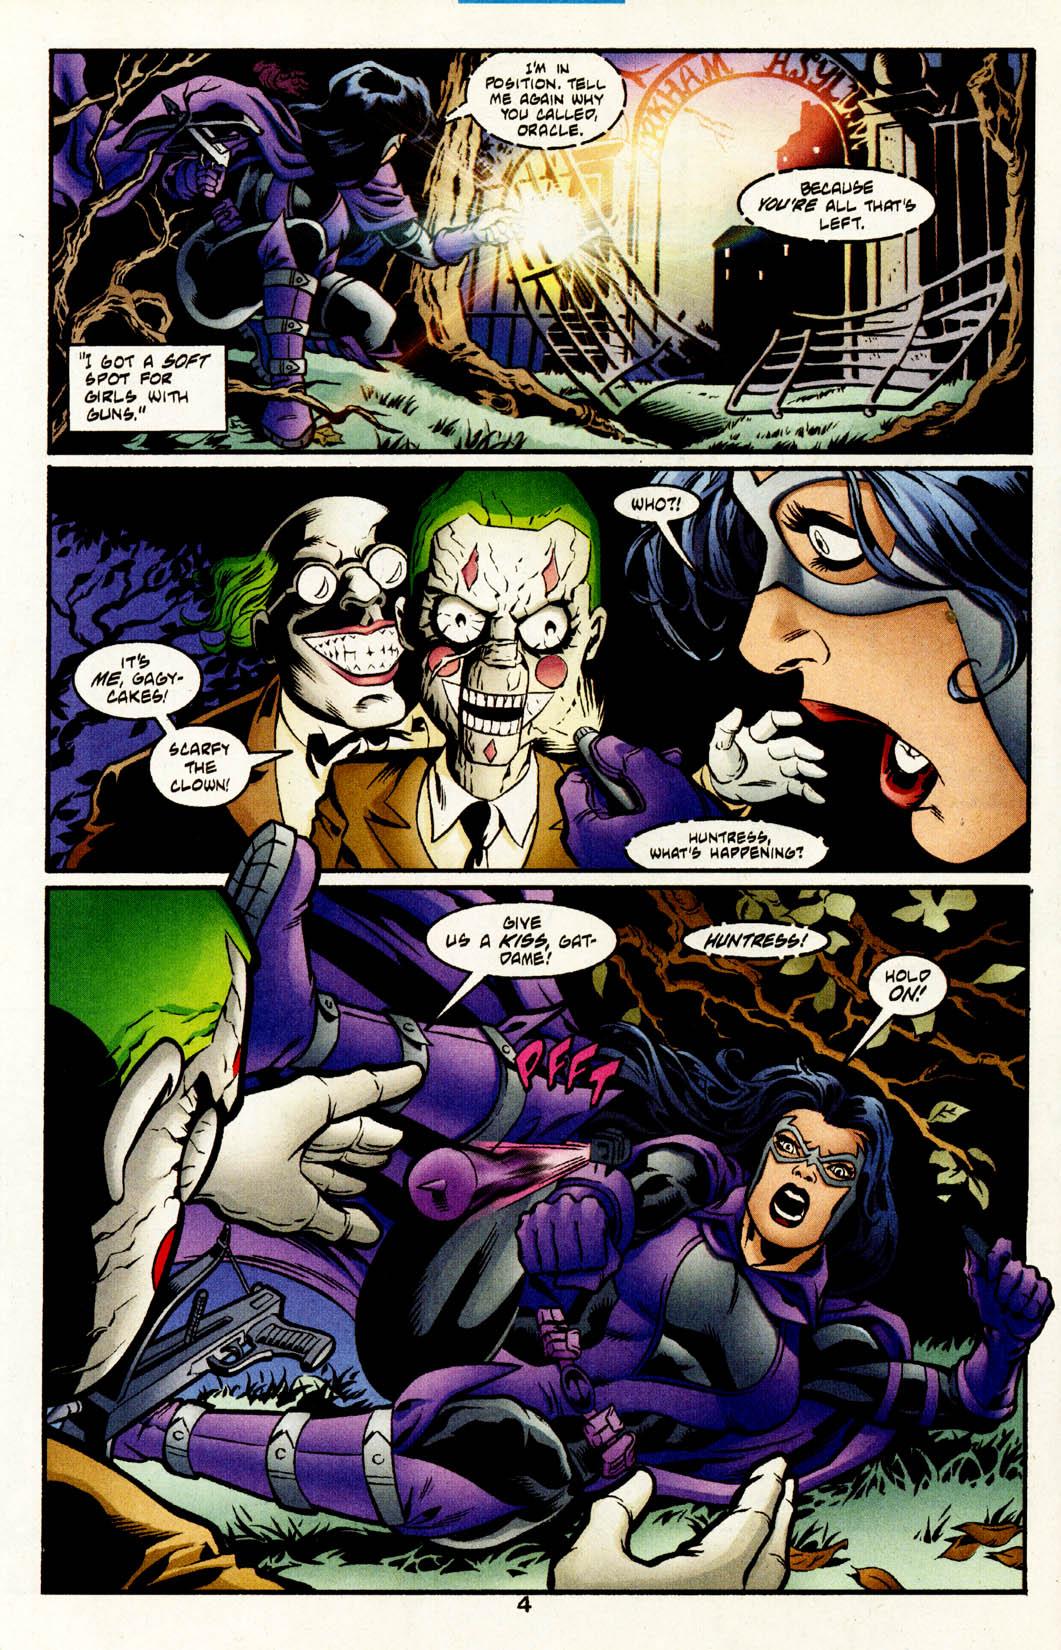 JokerLastLaughBk05of06-04HuntressScarface.jpg